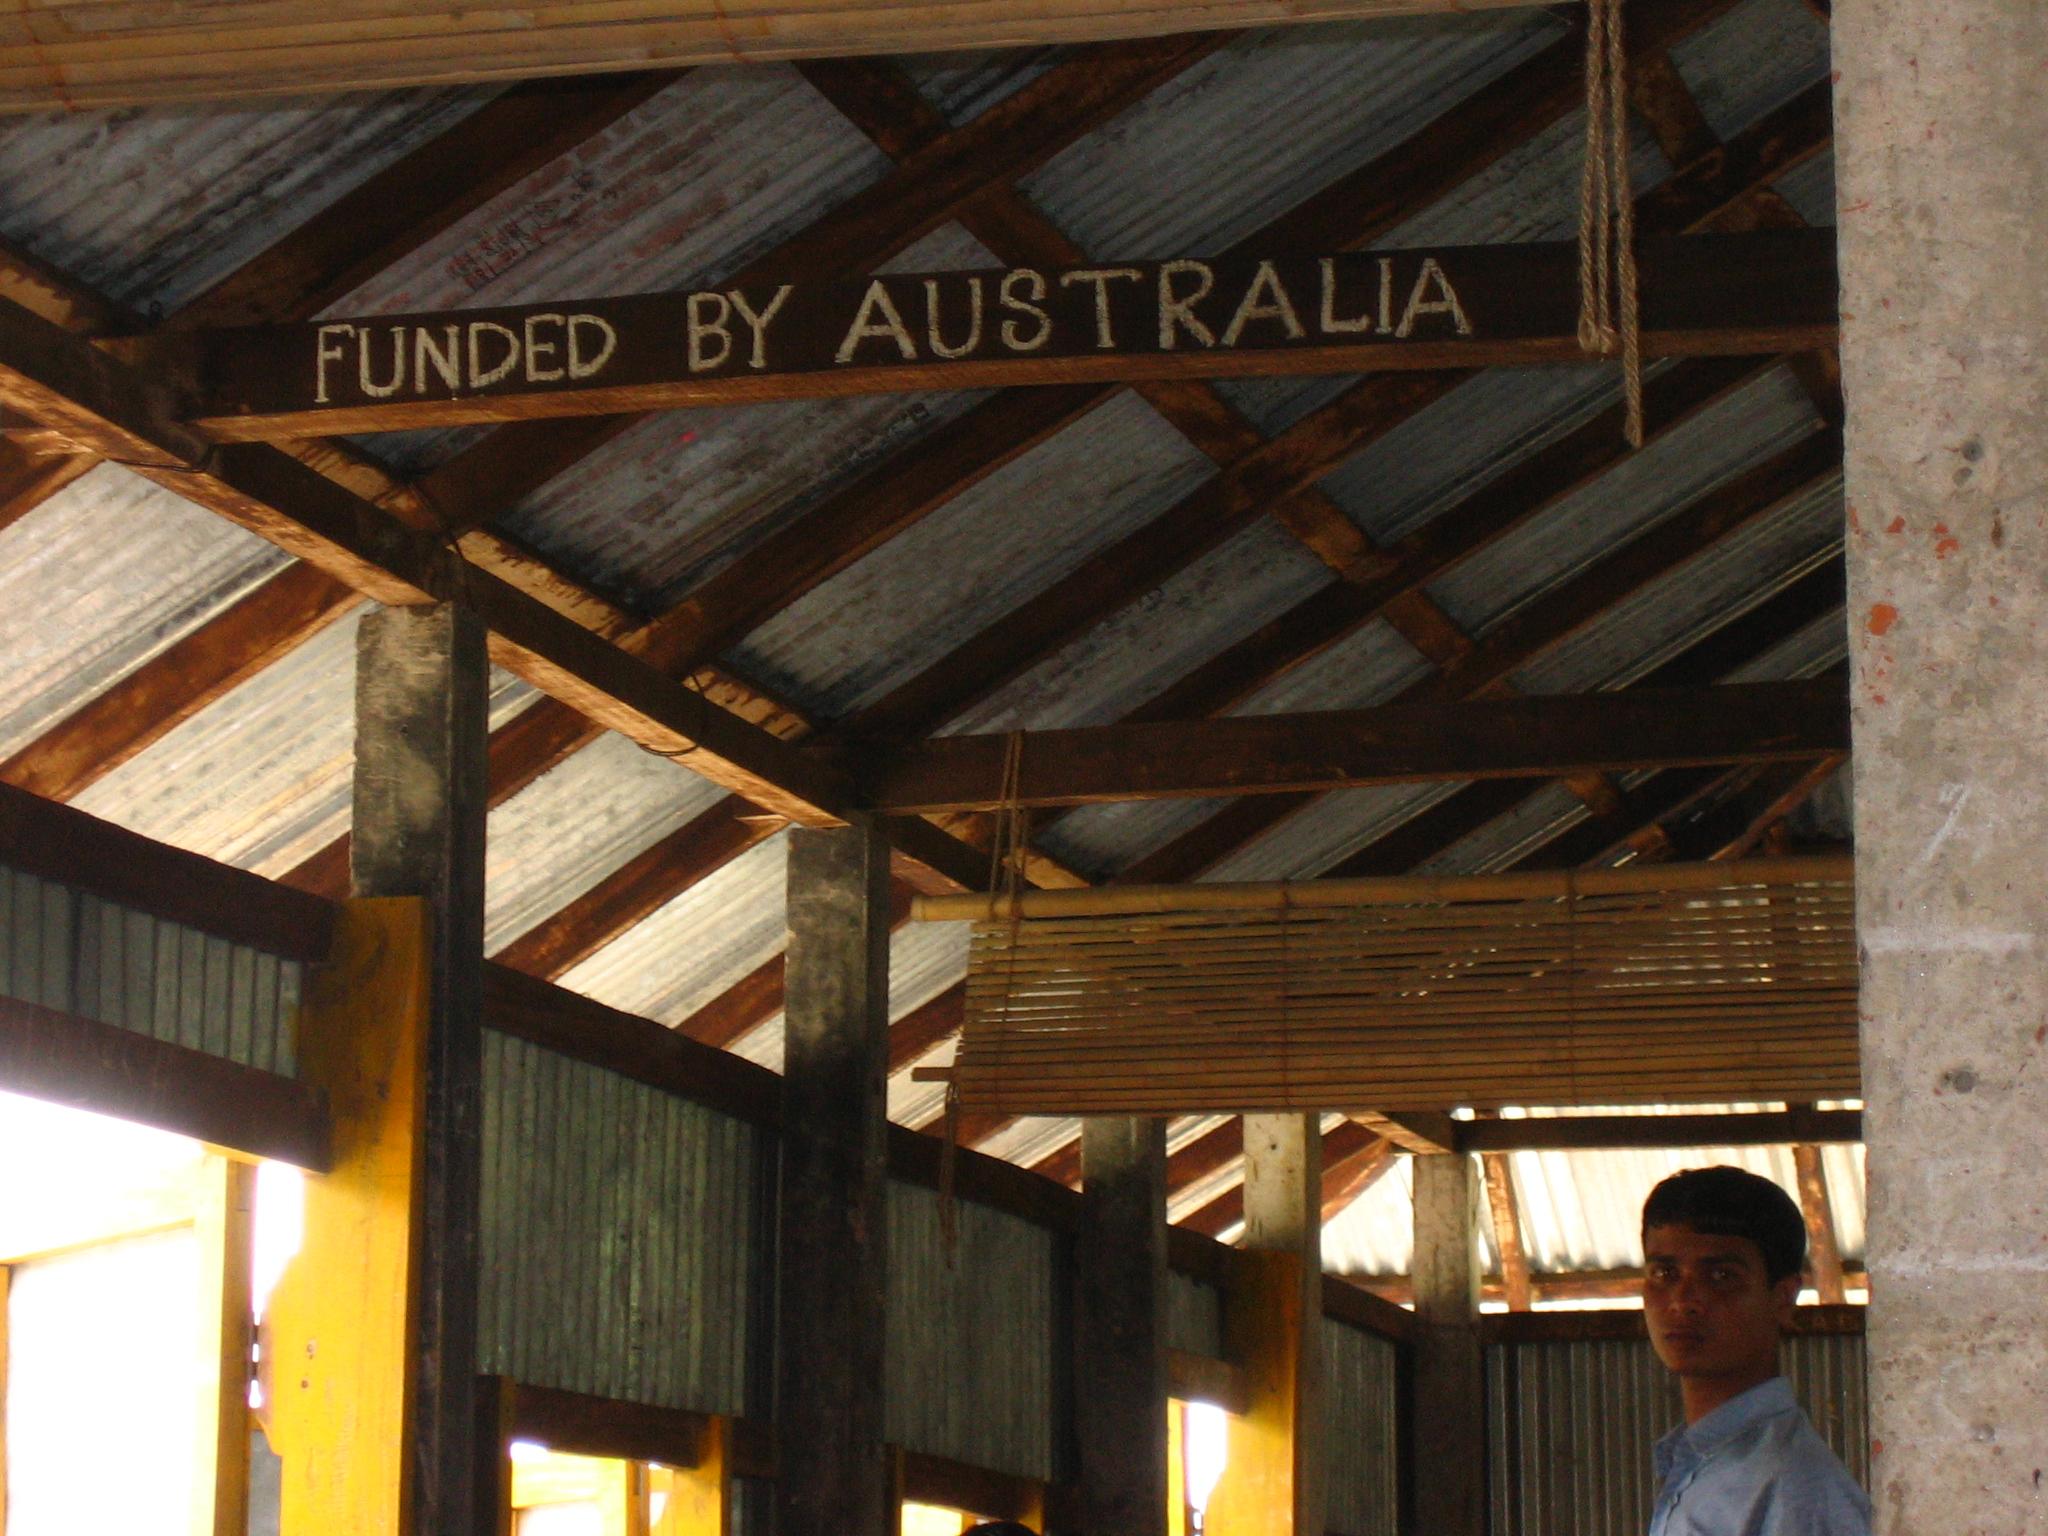 bhola island donation